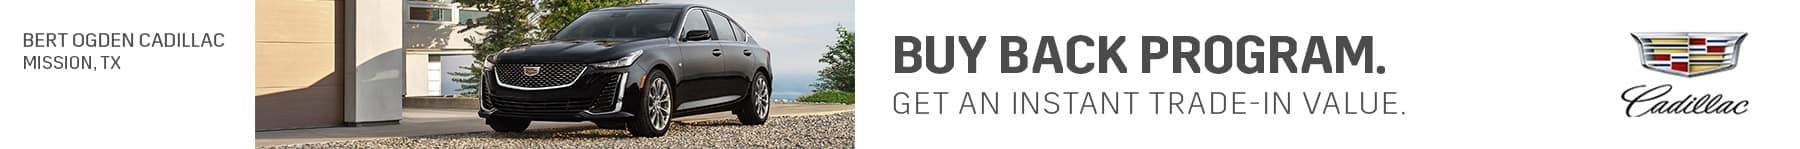 Buy Back Program | Bert Ogden Cadillac in Mission, Texas